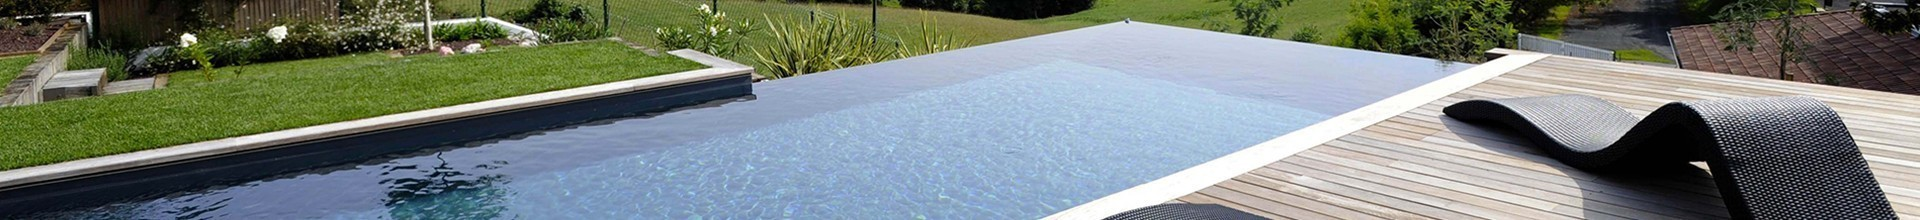 Direct usine, piscine coque prix Winterthour